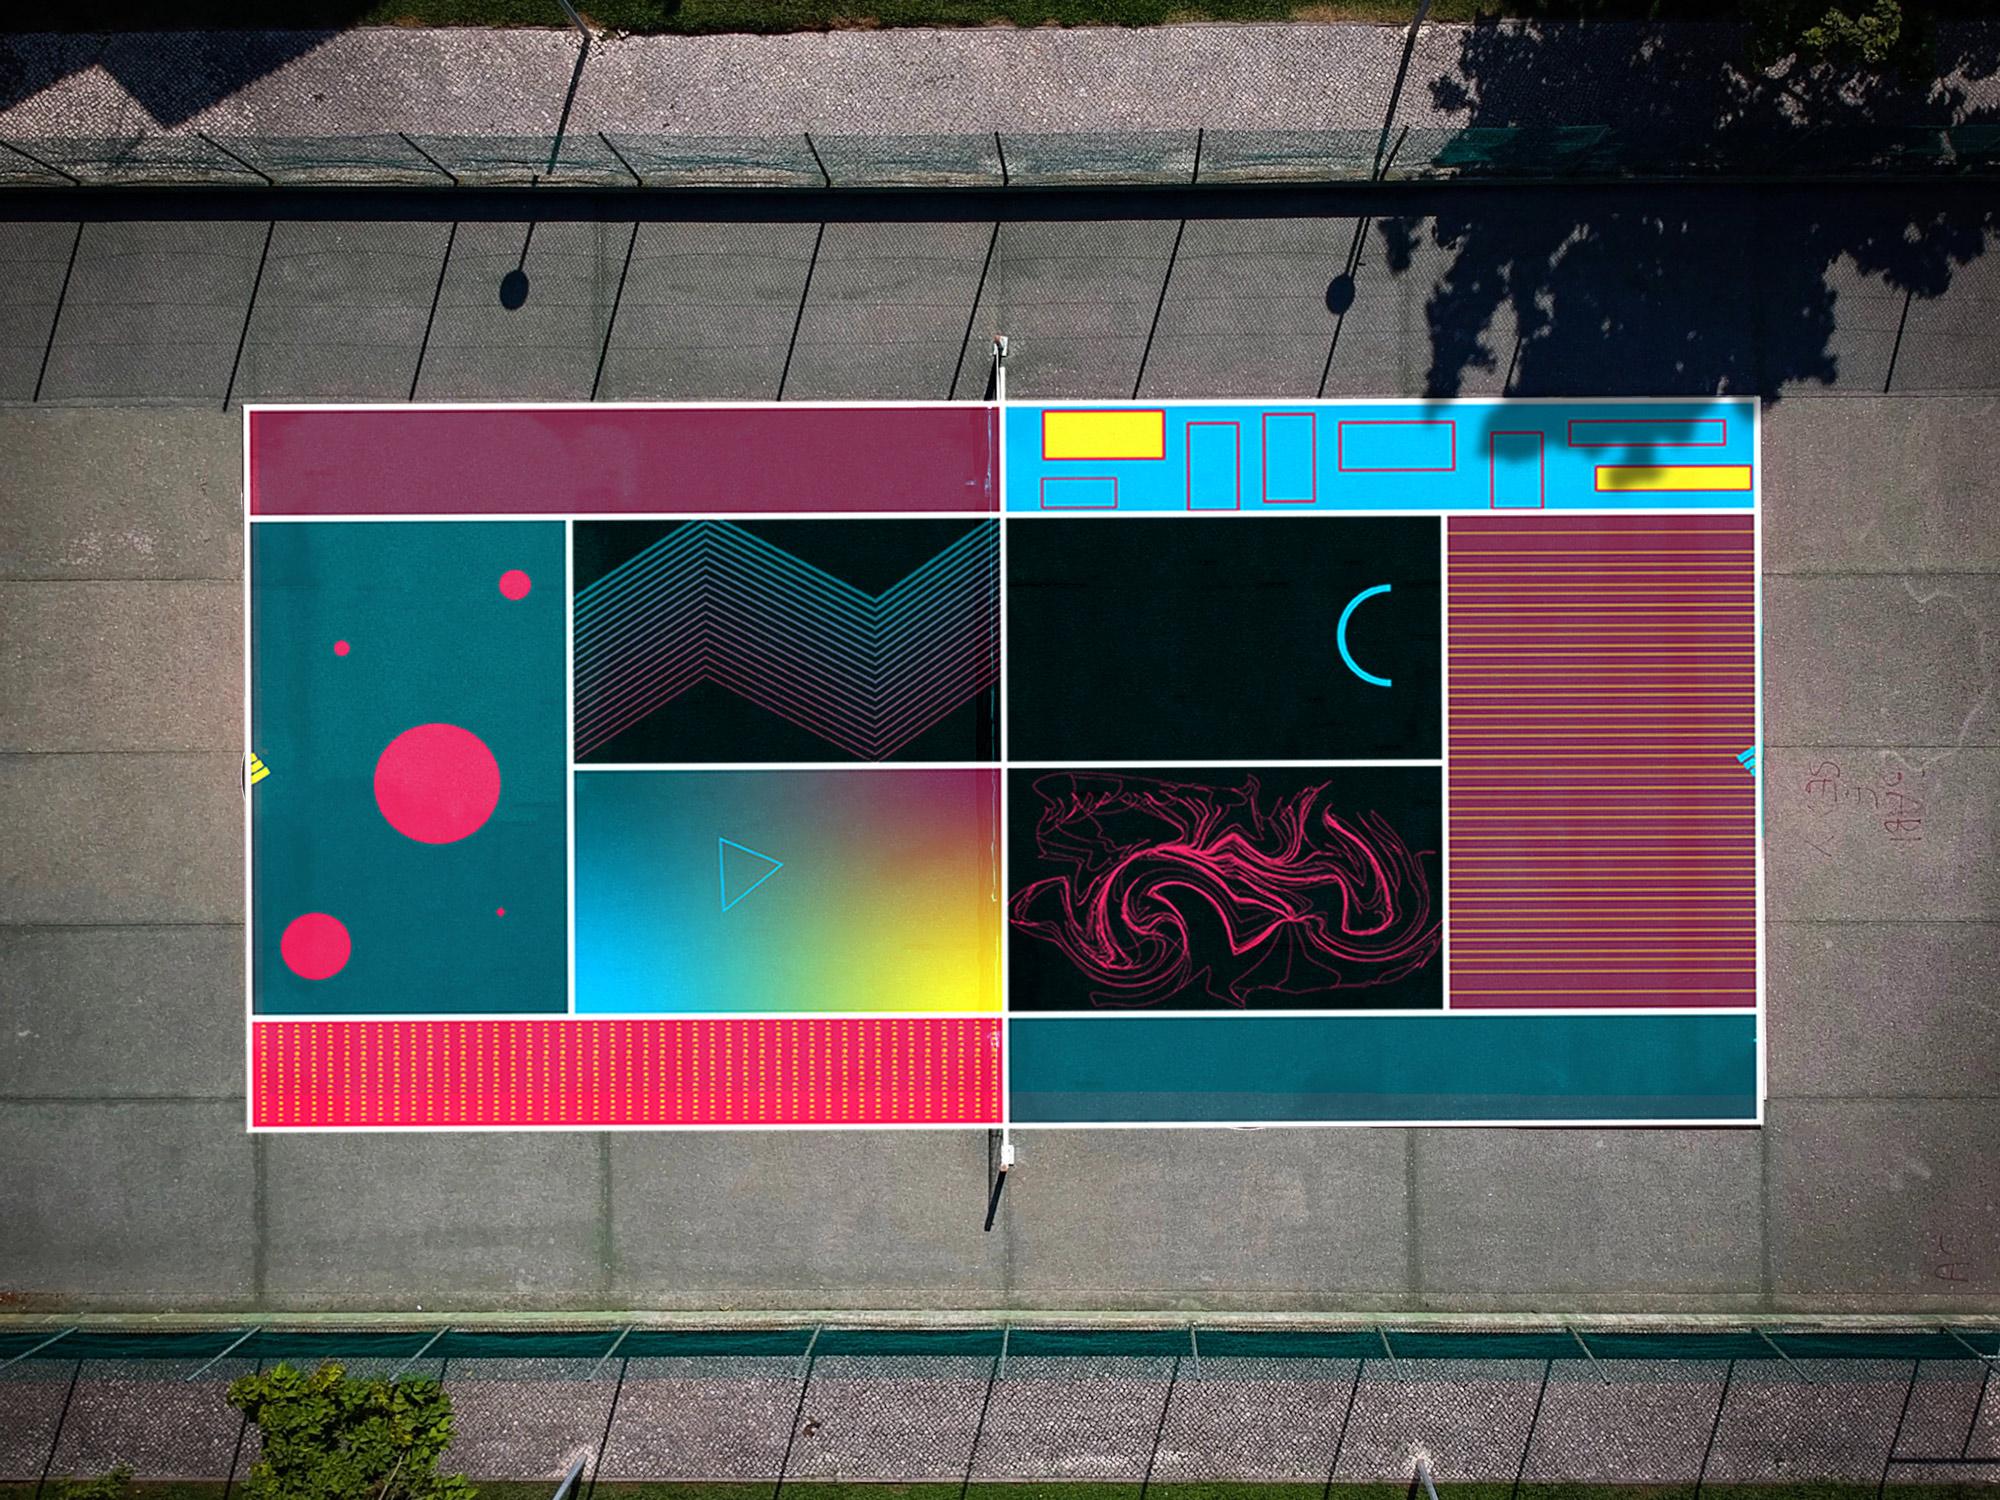 tennis-court-mockup1